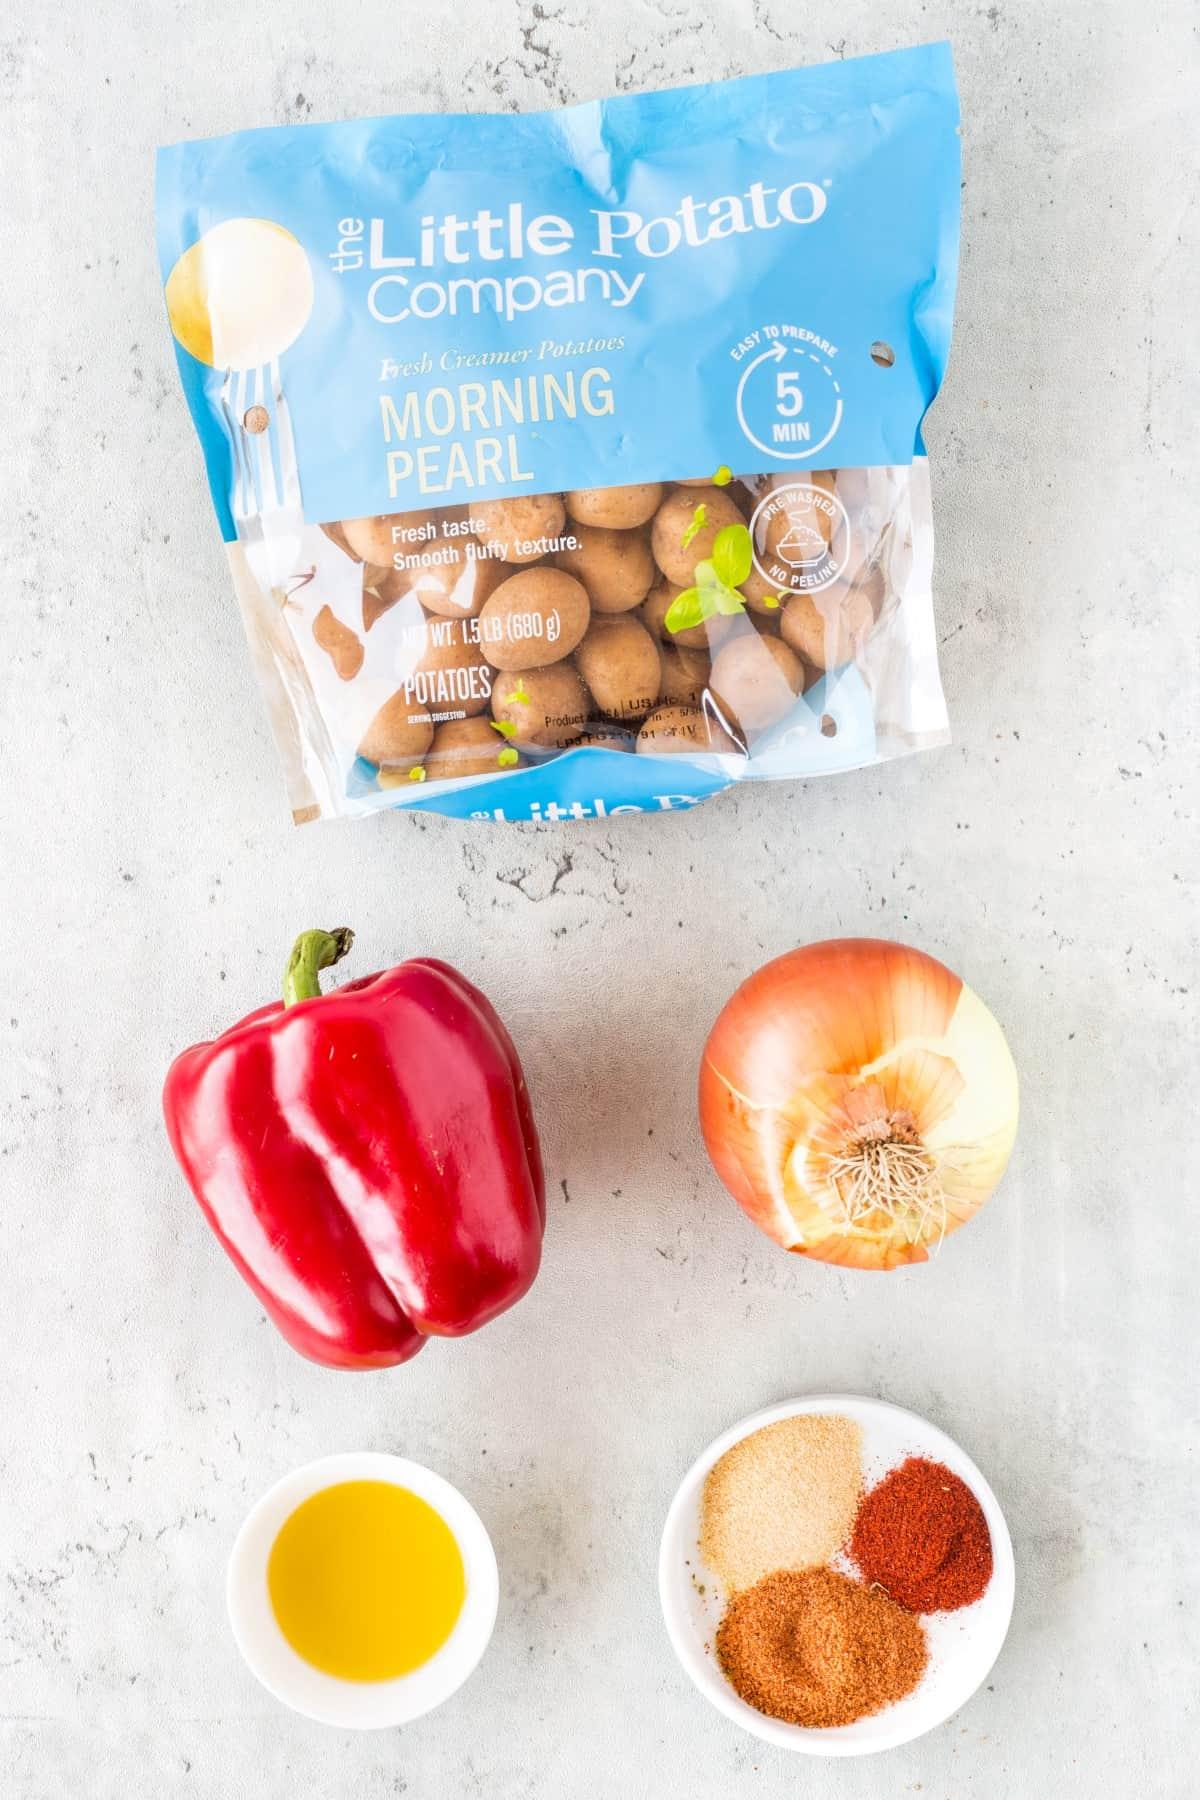 Ingredients for Air Fryer Diner Home Fries